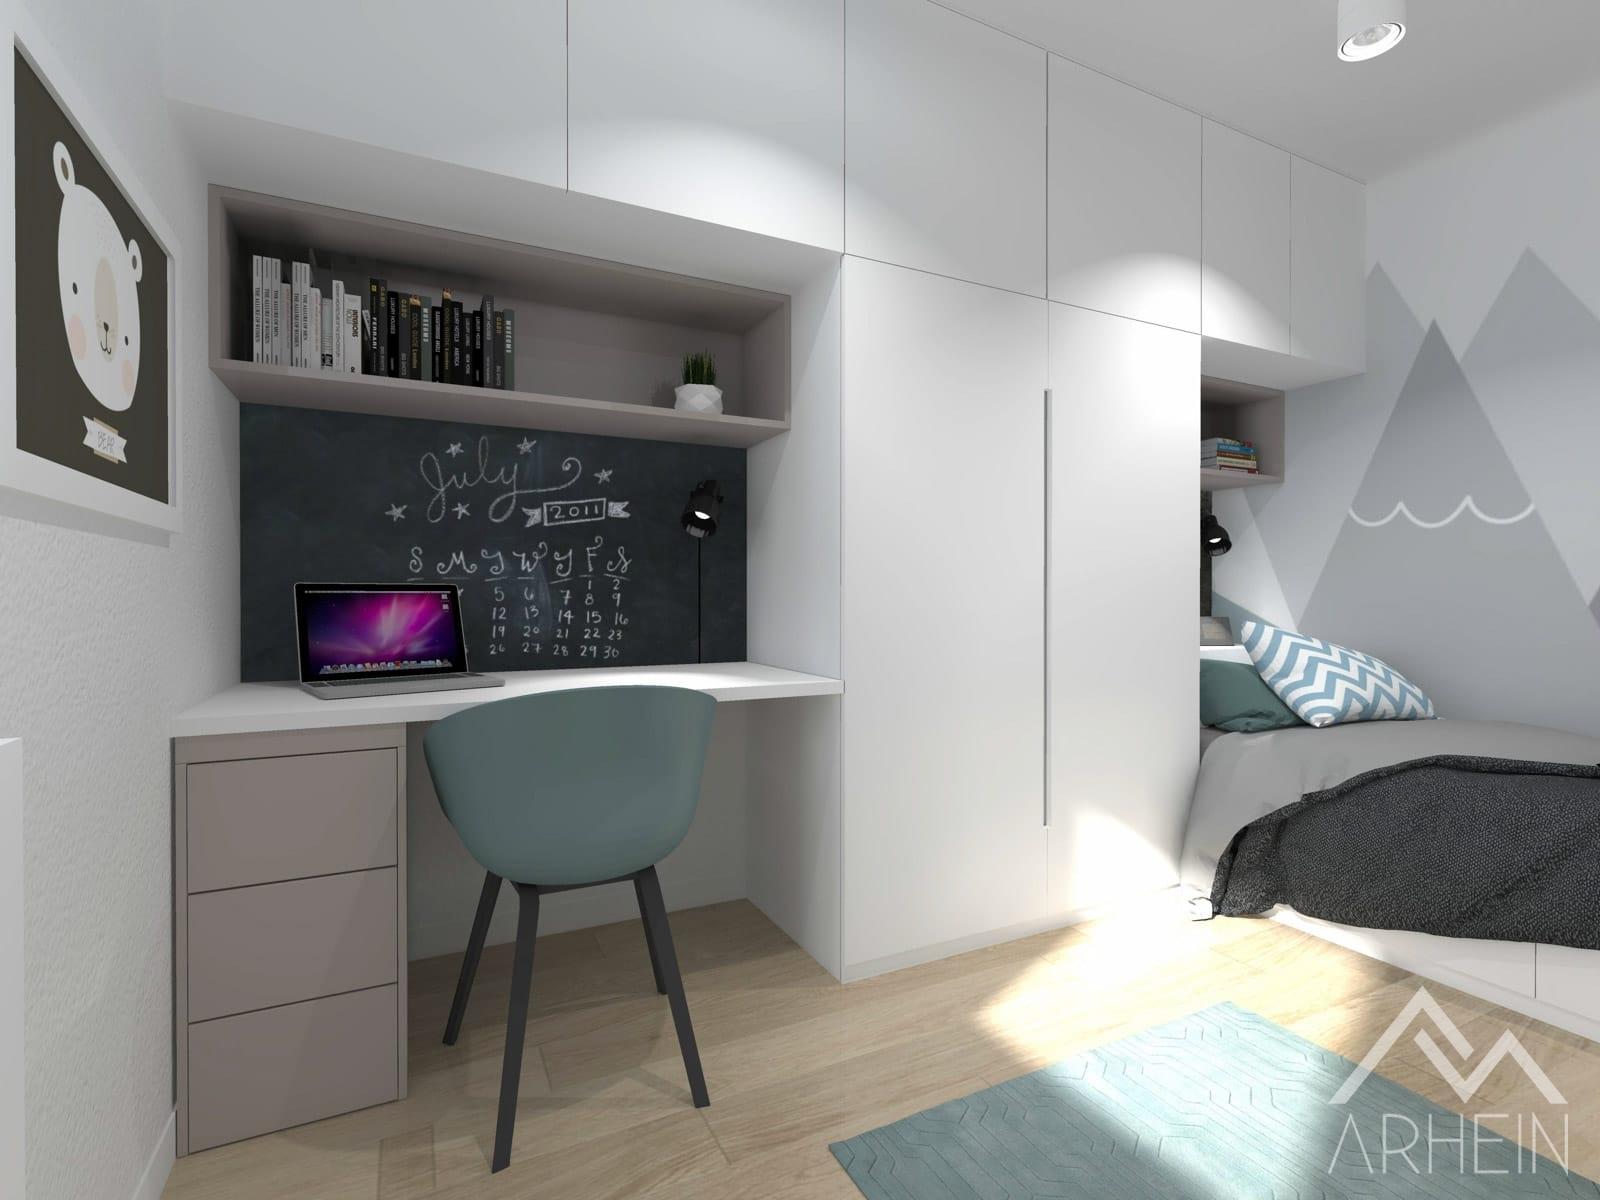 arhein-arhitektura-stanovanje-kandija-interier-oblikovanje-stanovanje-arhitektura-notranje-oblikovanje-6